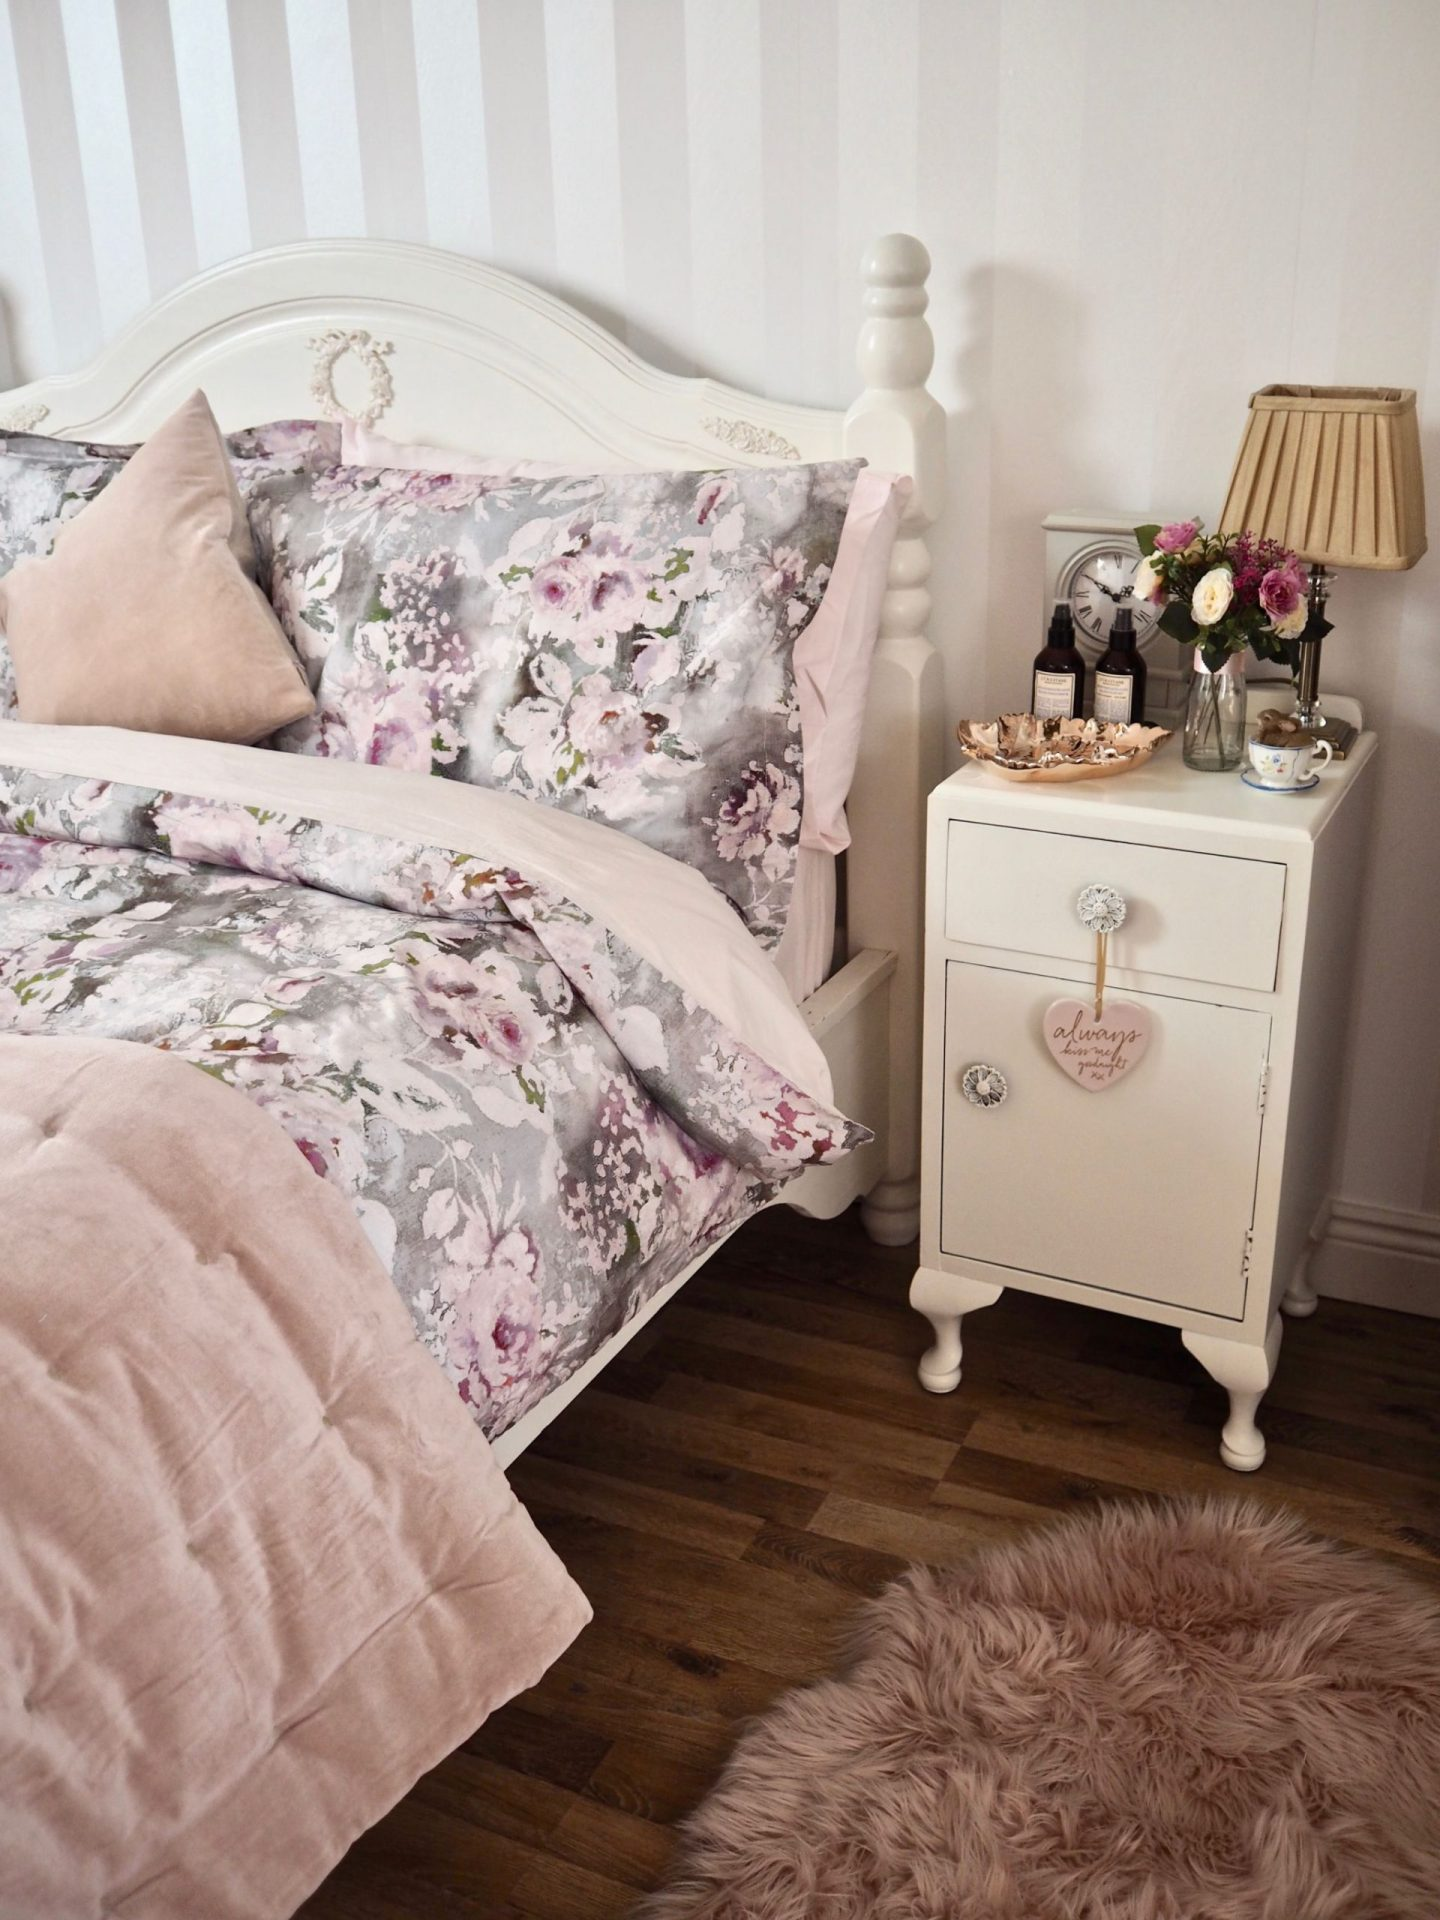 Bedroom decor, shabby chic cottage decor